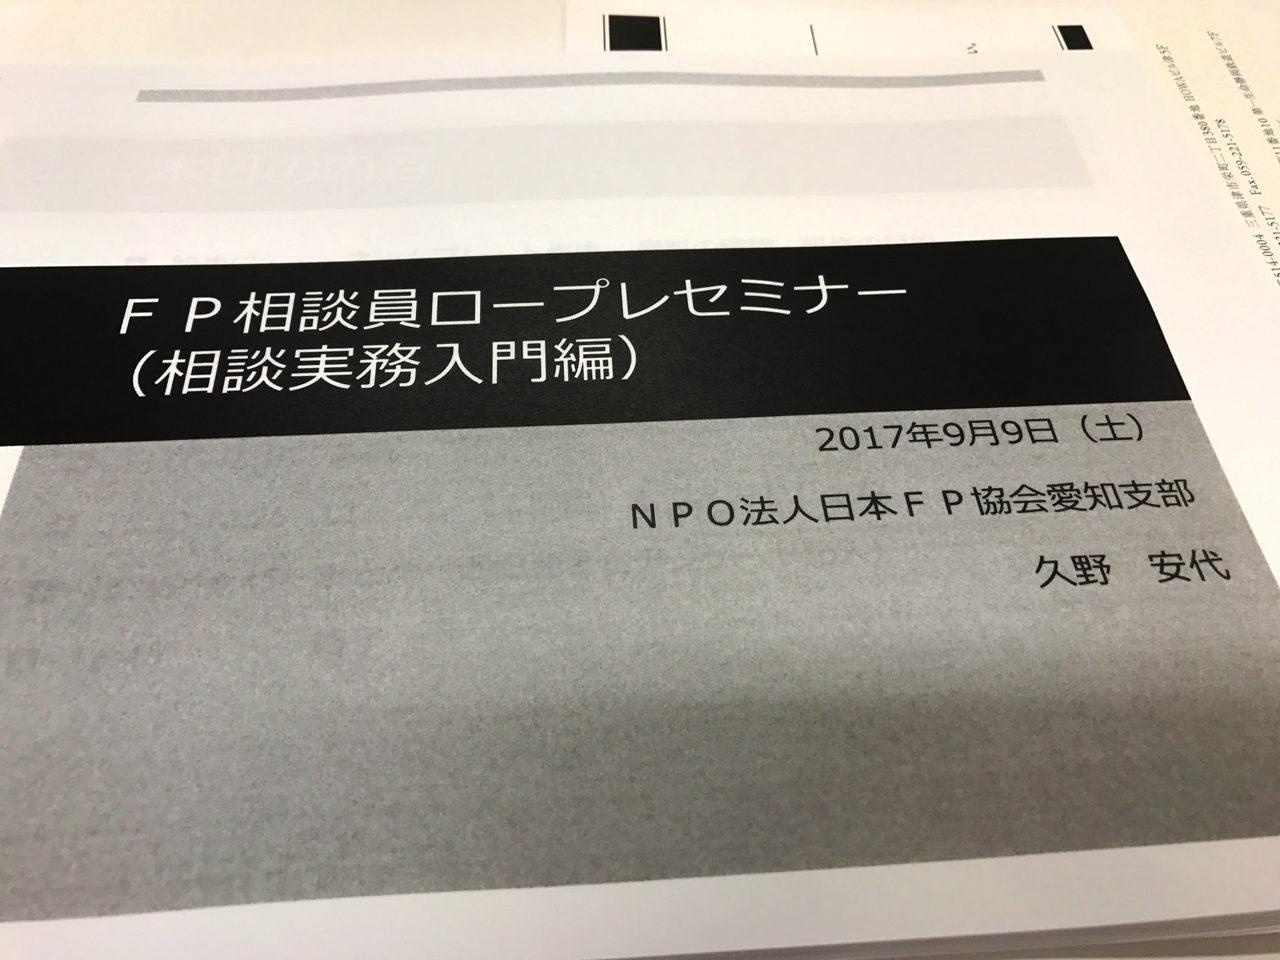 FP相談員ロープレセミナー(相談実務入門編)|ファイナンシャルプランナー